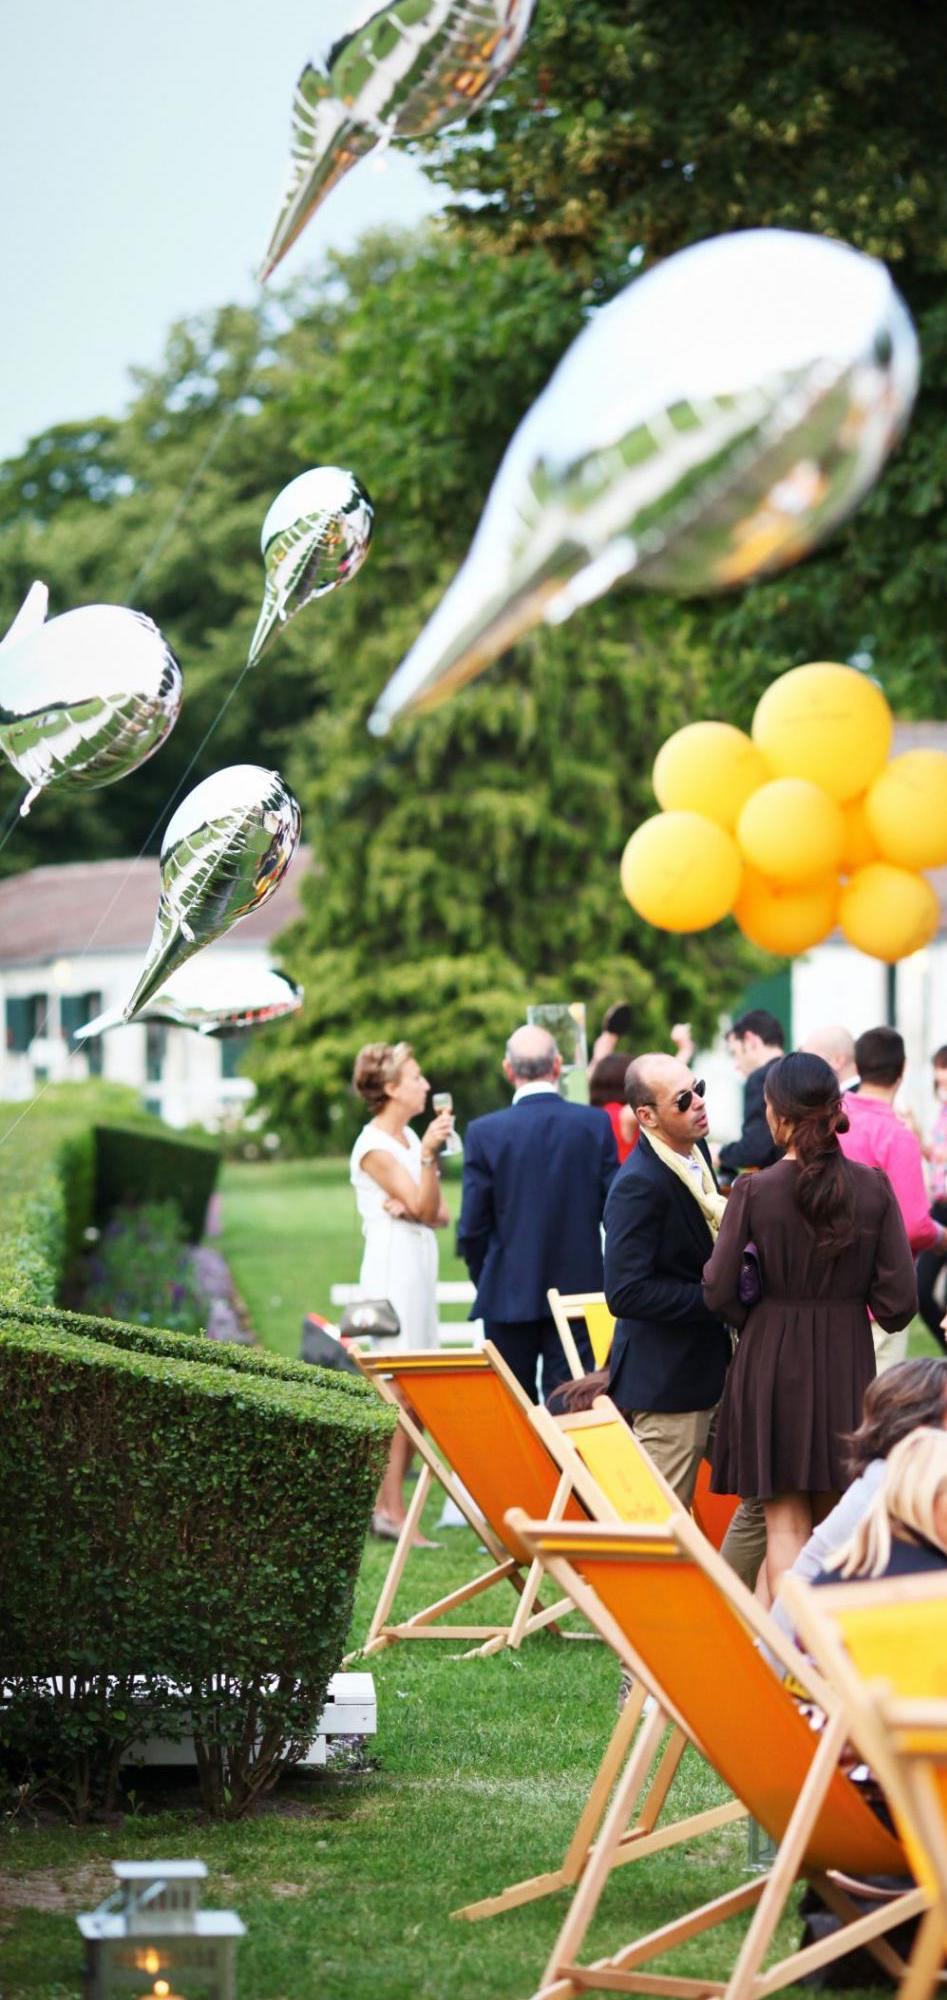 889781-lors-de-la-garden-party-veuve-clicquot-950x0-2.jpg